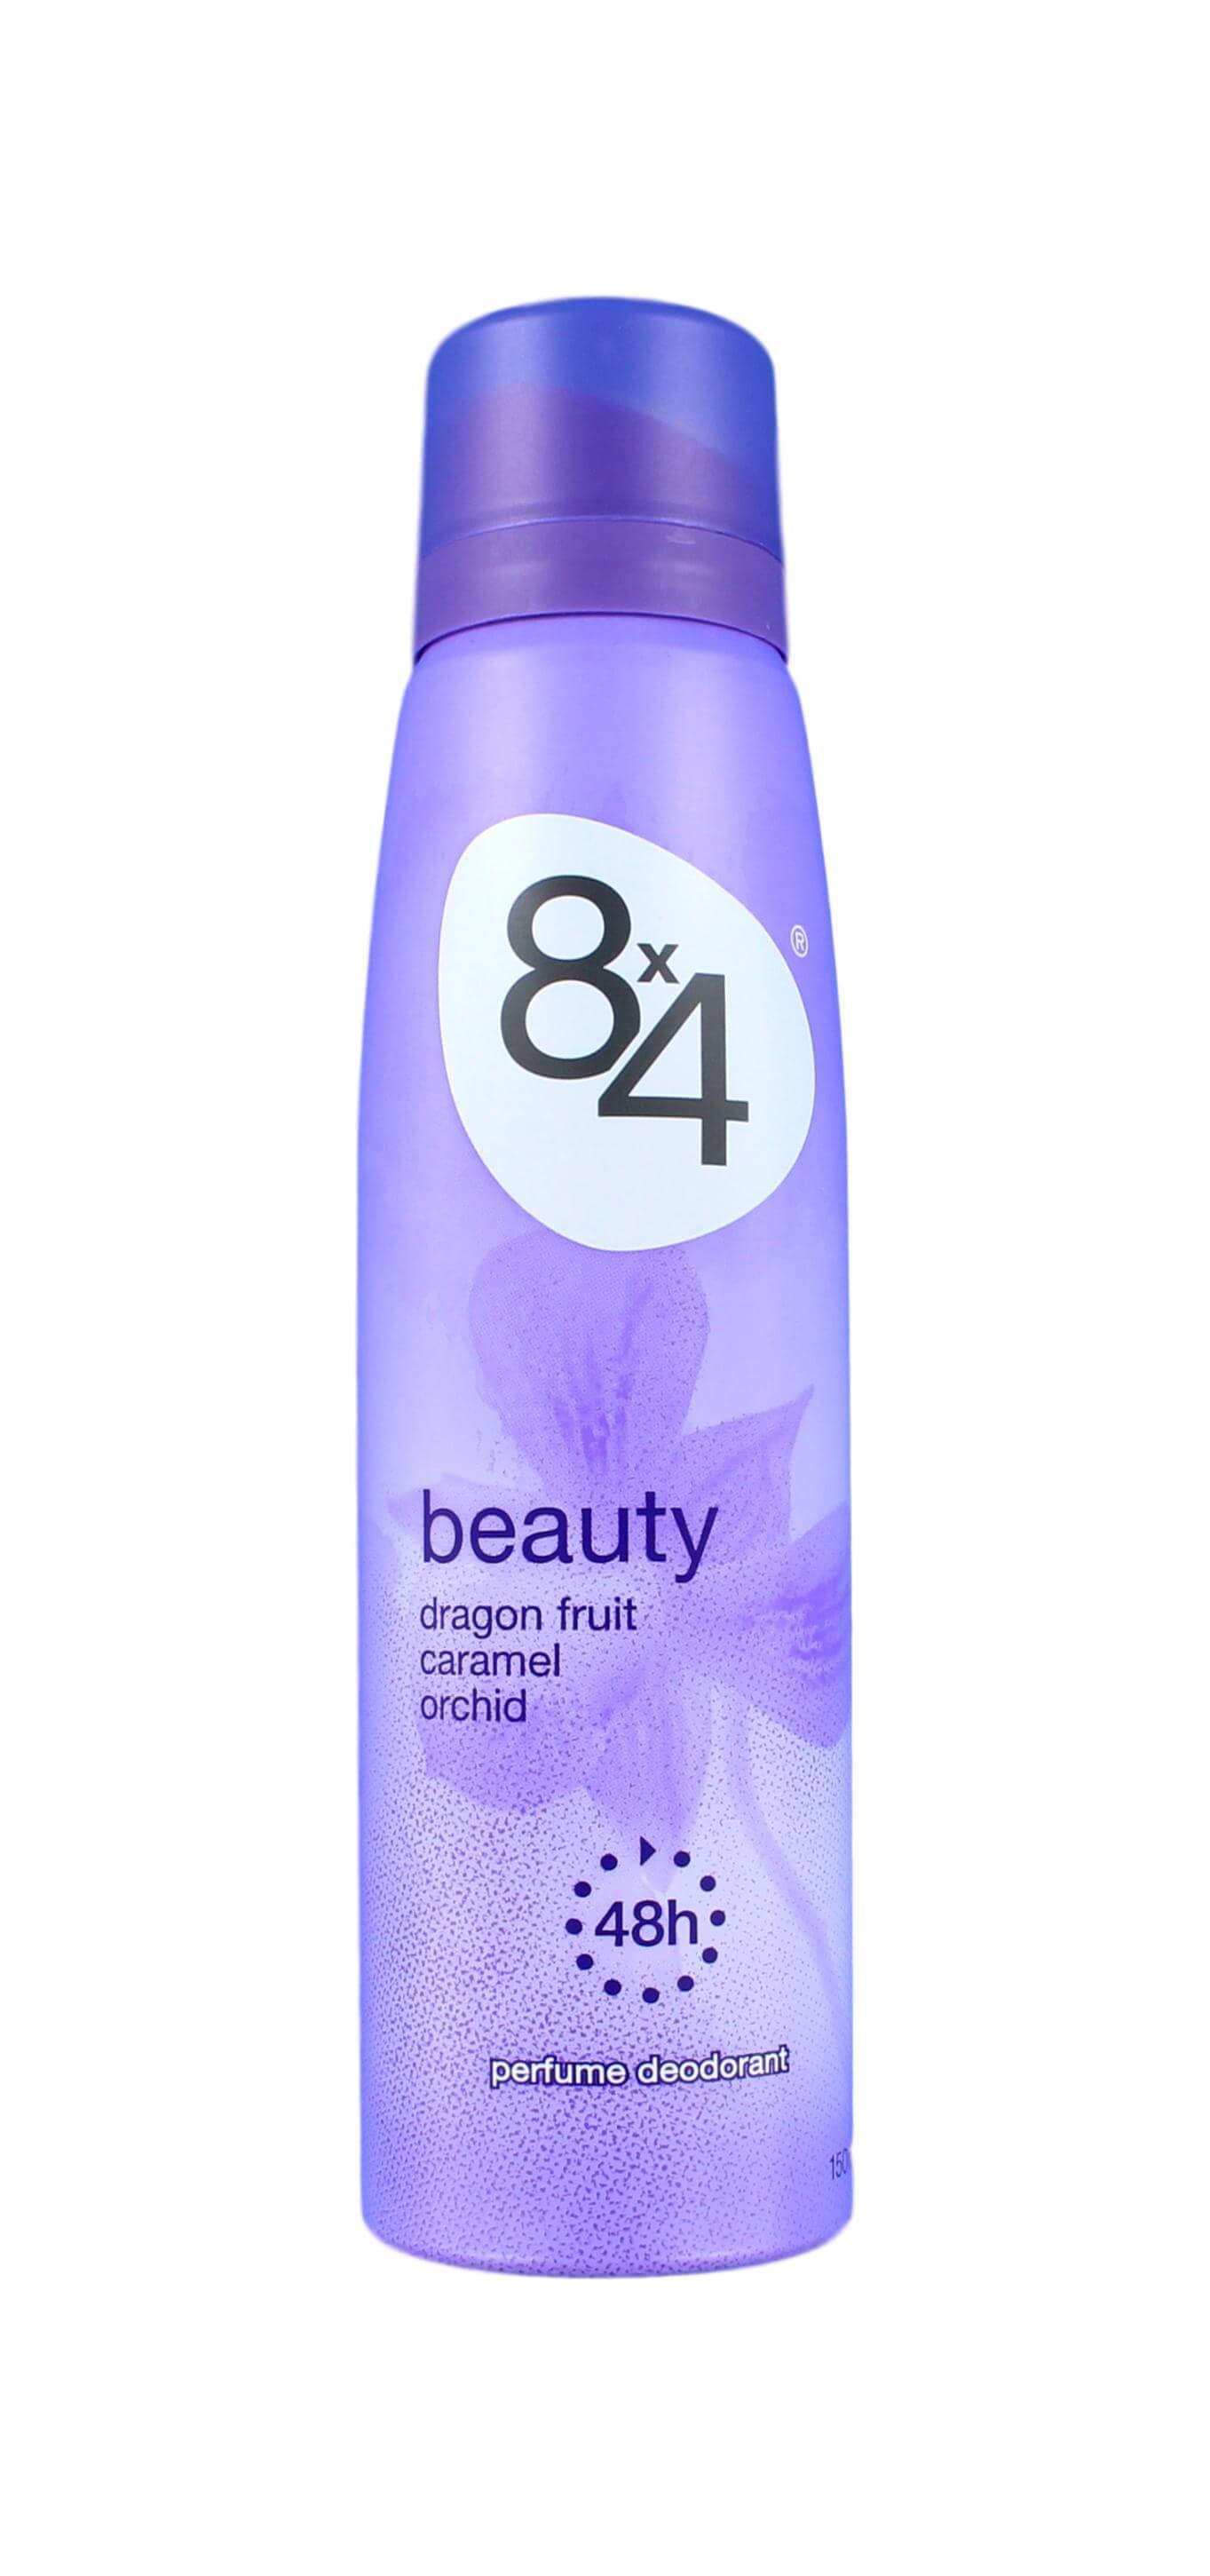 8x4 Deodorant beauty, 150 ml